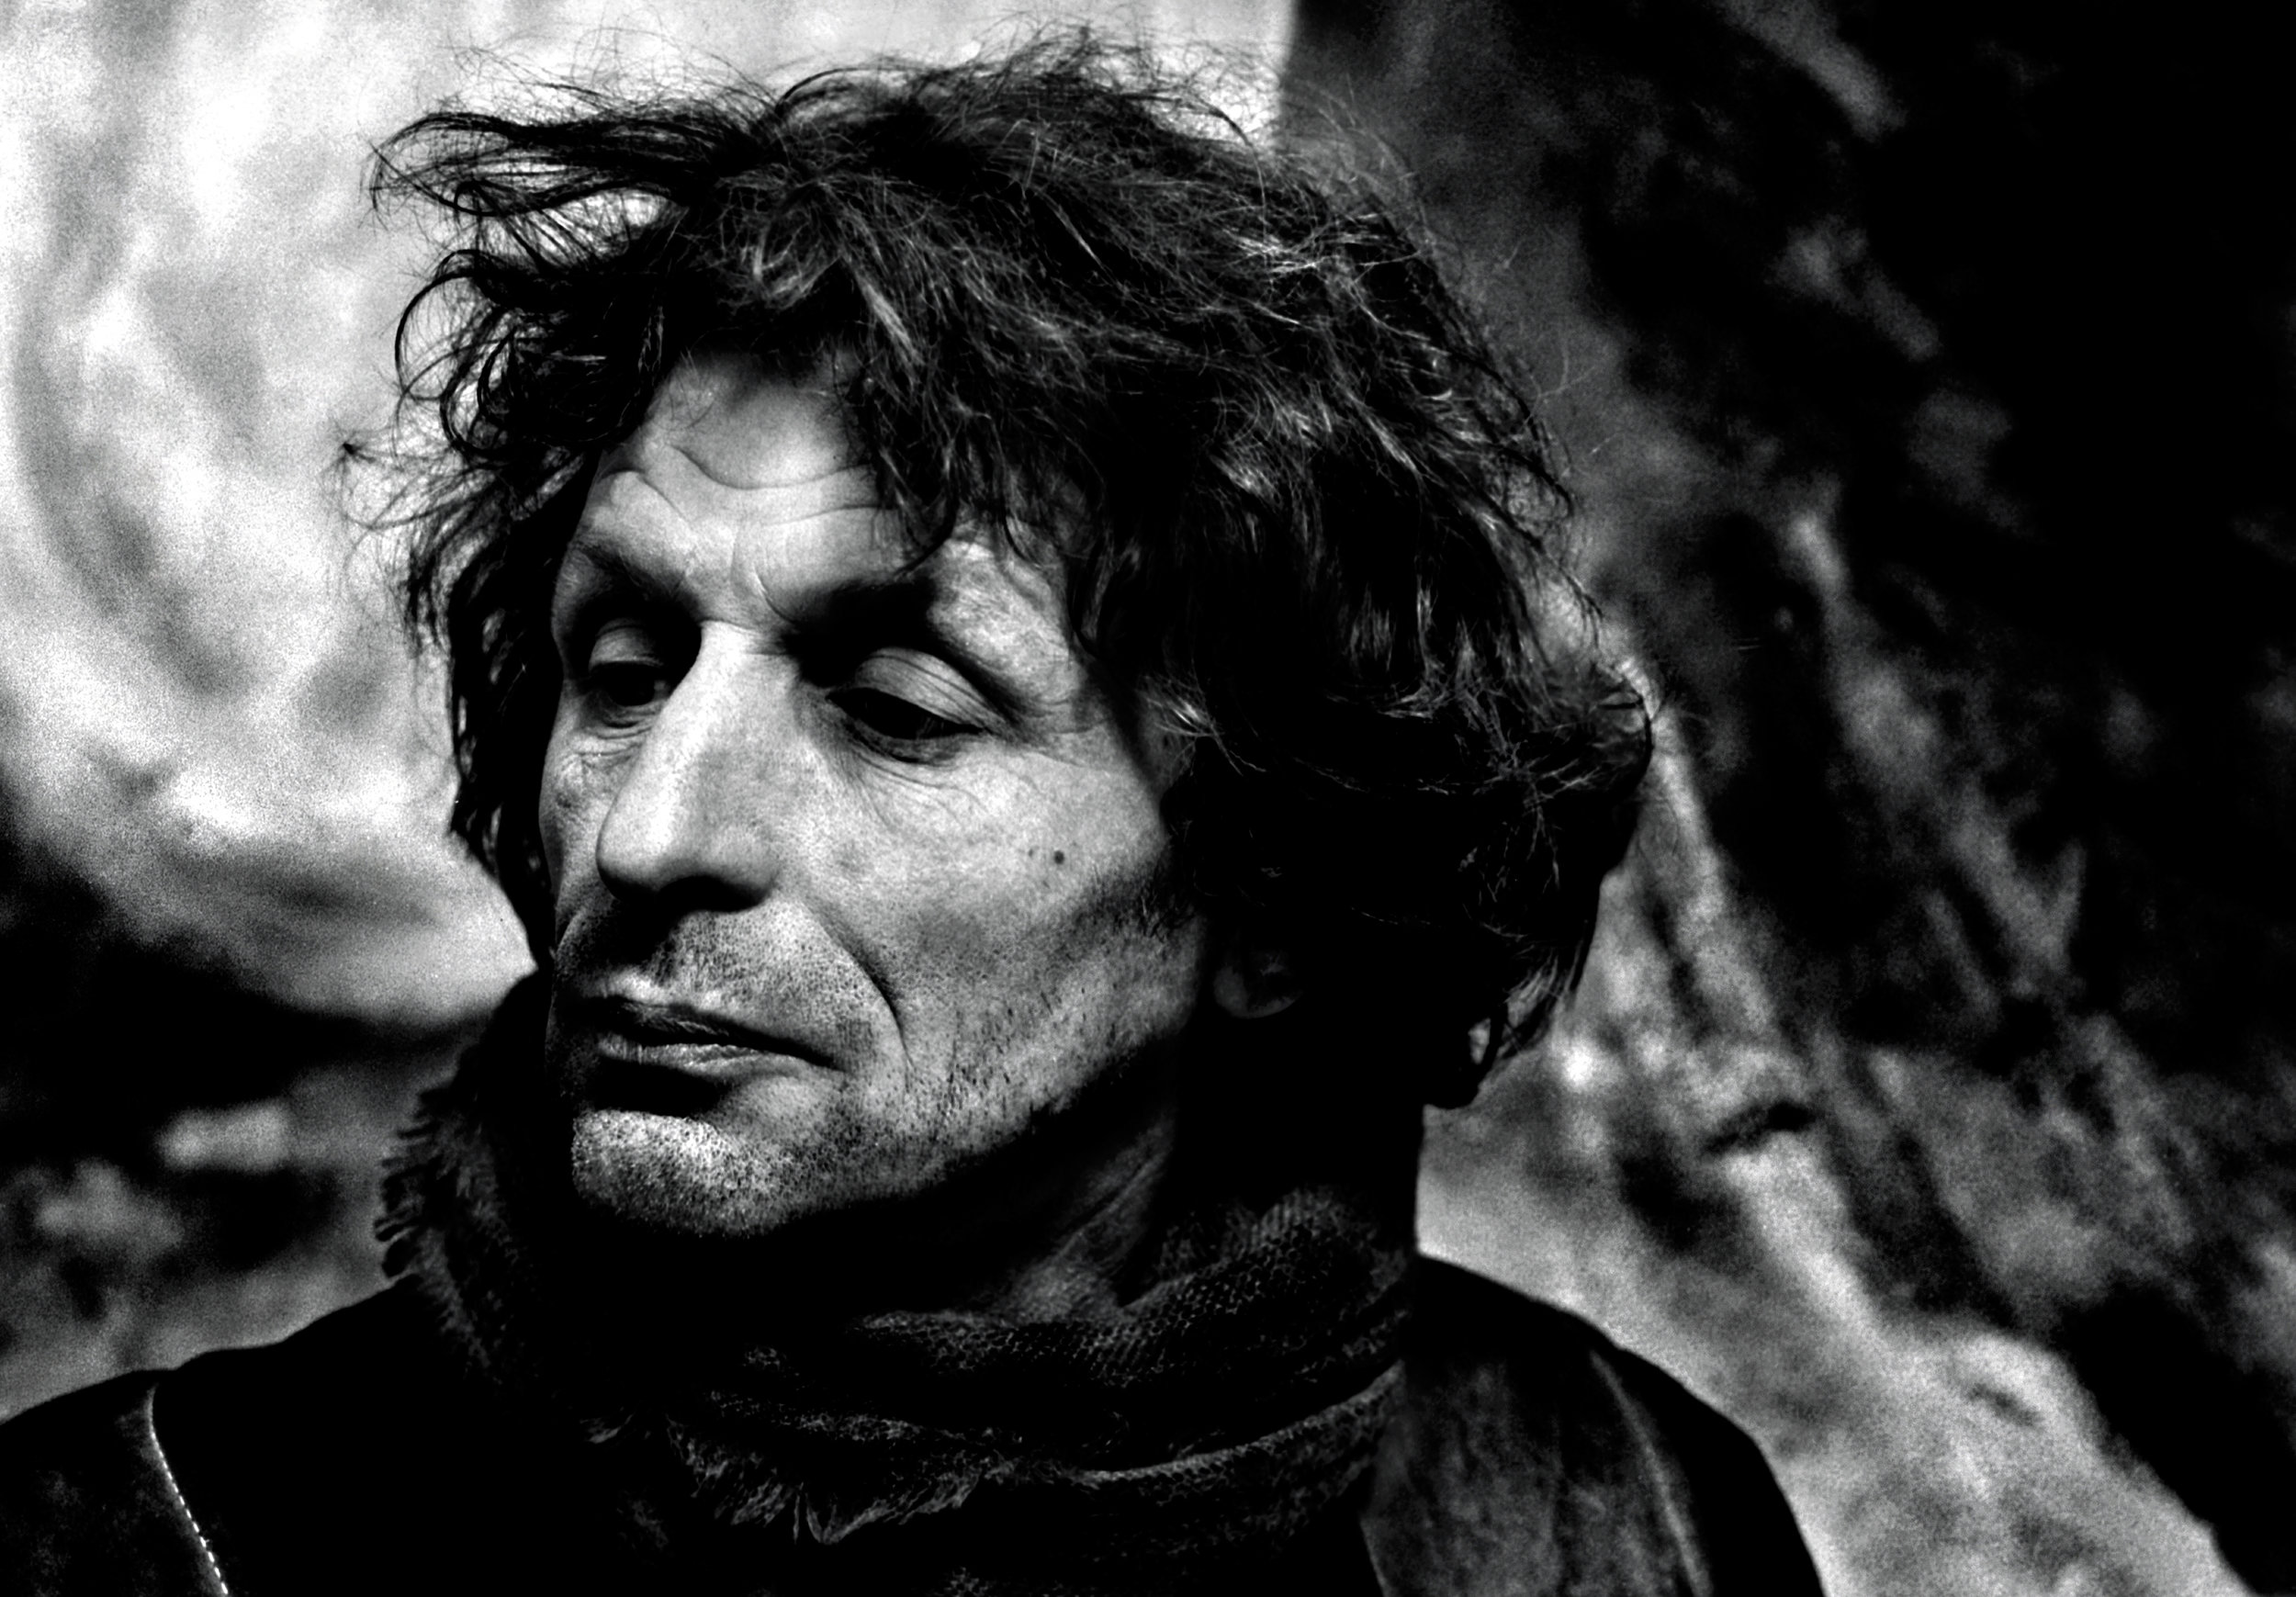 frans-widerberg-painter-1983-photo-morten-krogvold_small.jpg